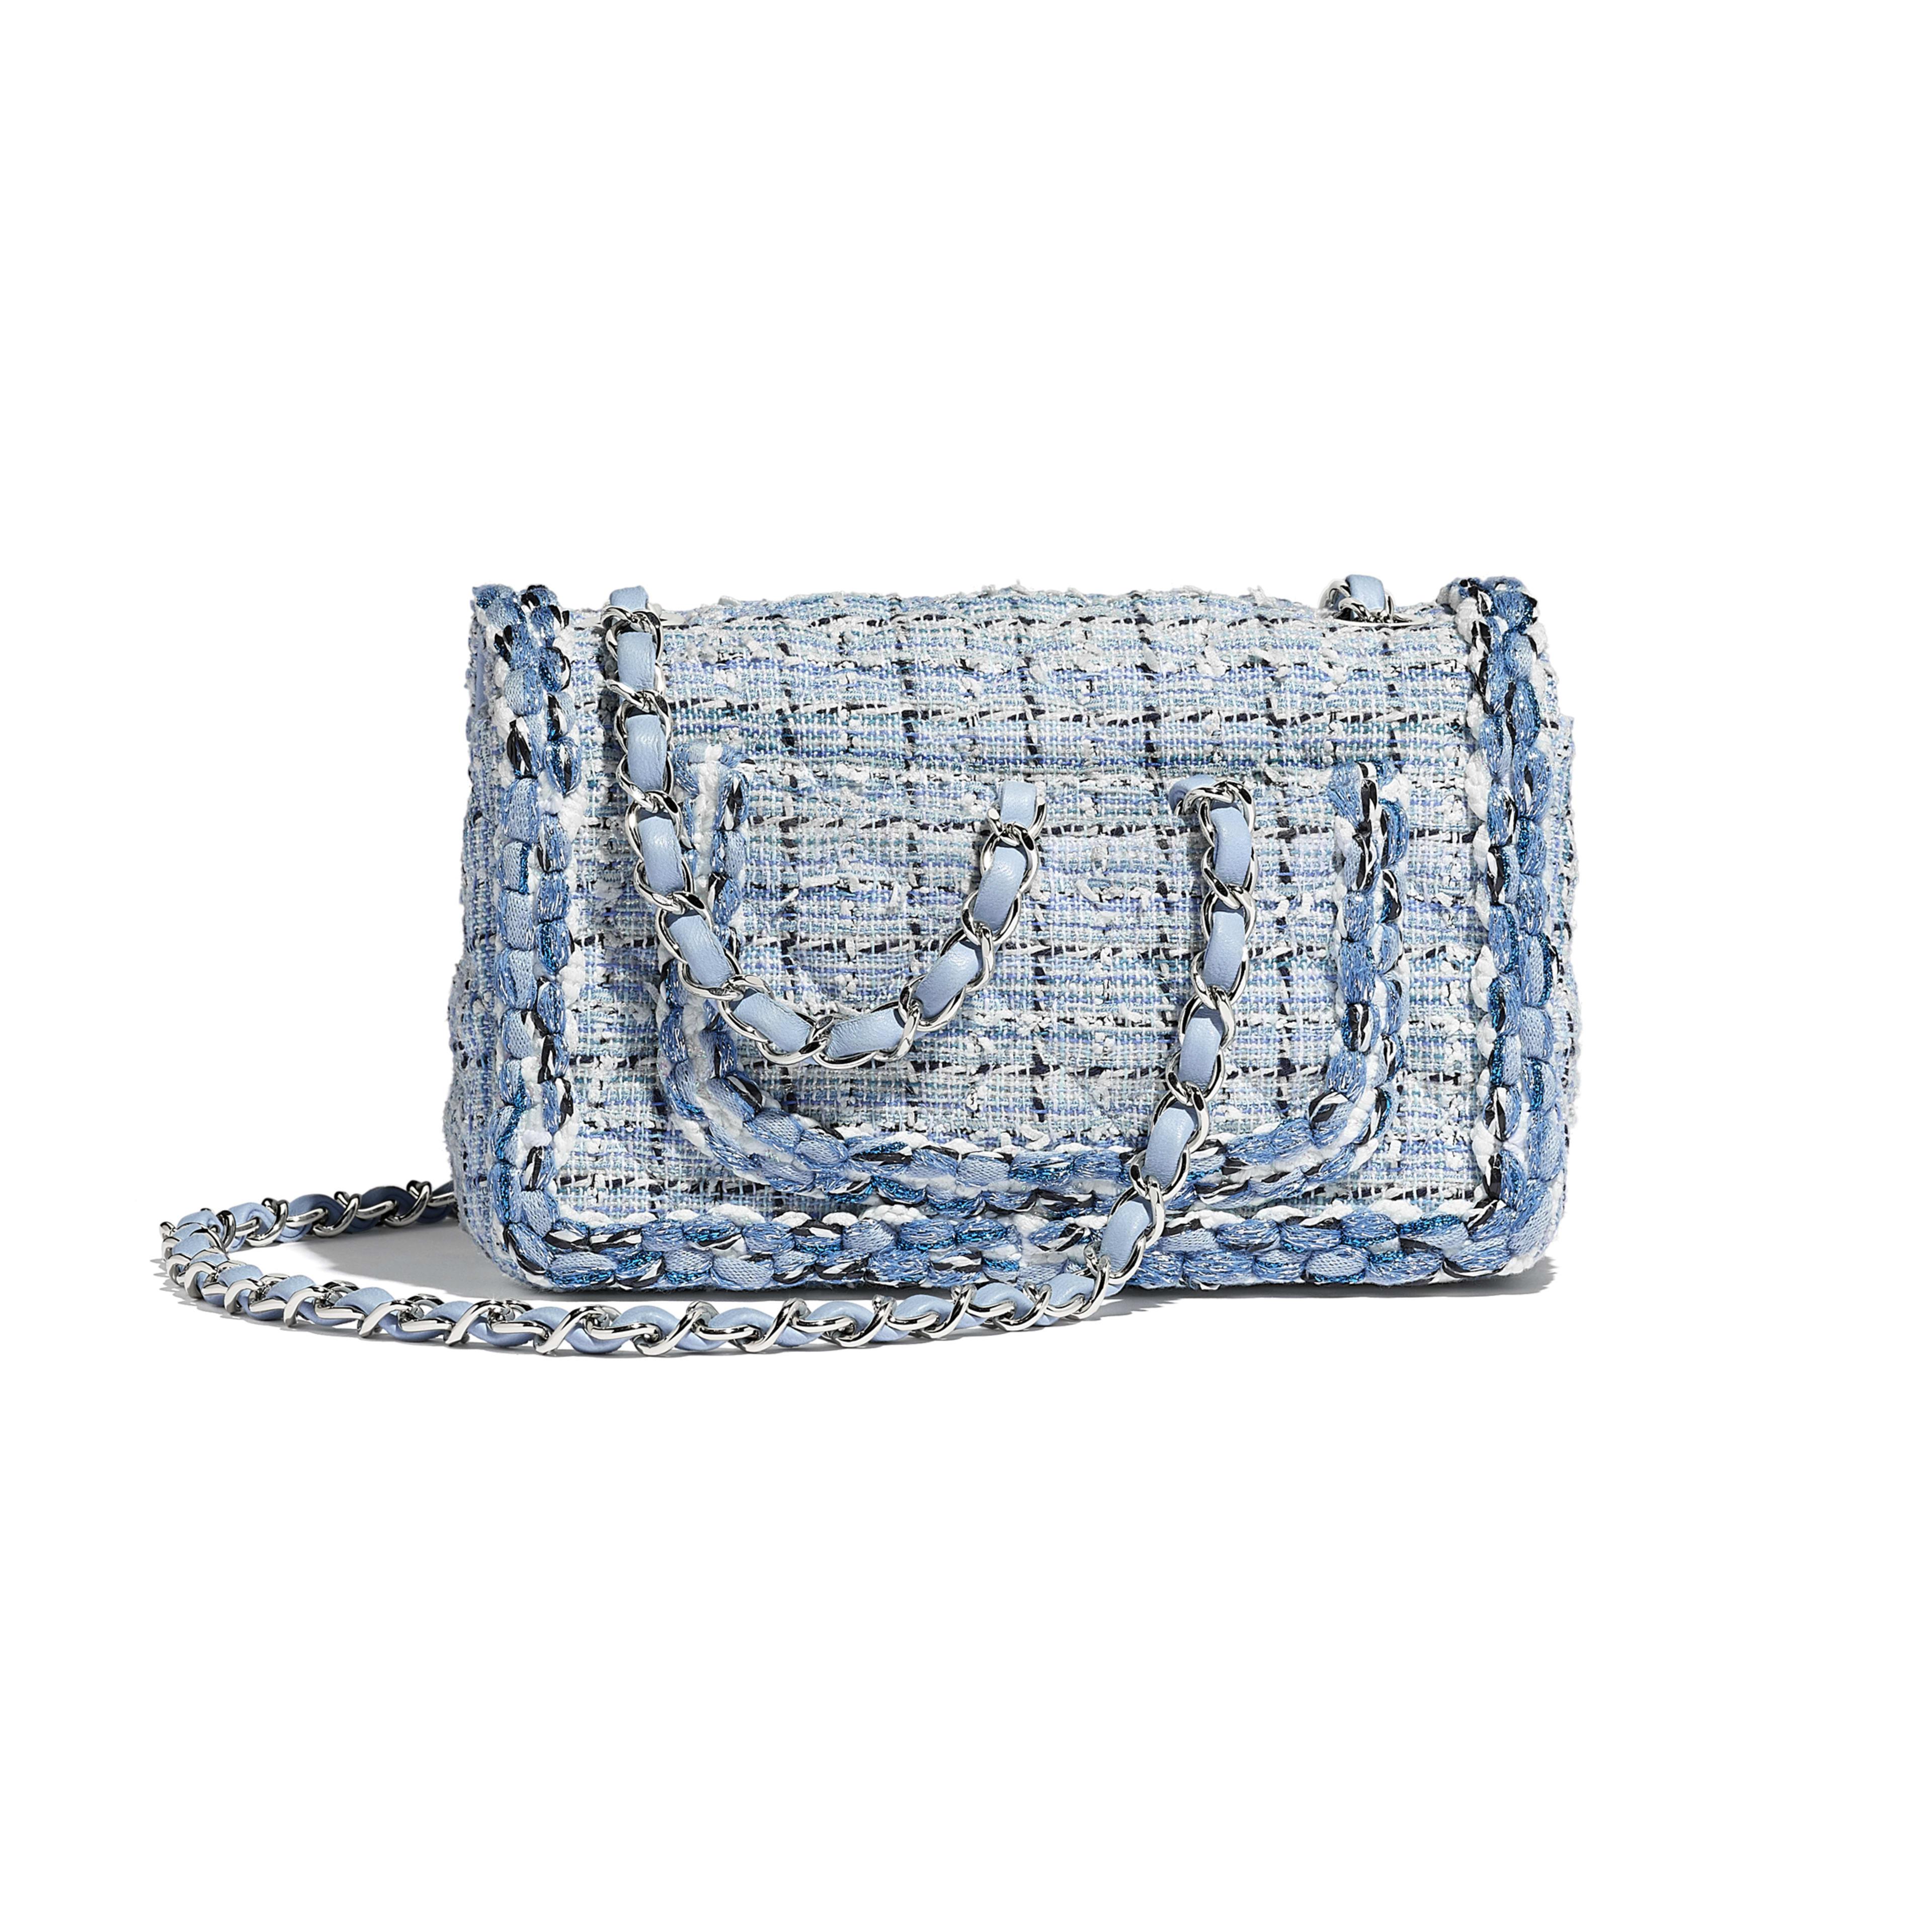 Mini Flap Bag - Blue & White - Tweed, Braid & Silver-Tone Metal - Alternative view - see full sized version